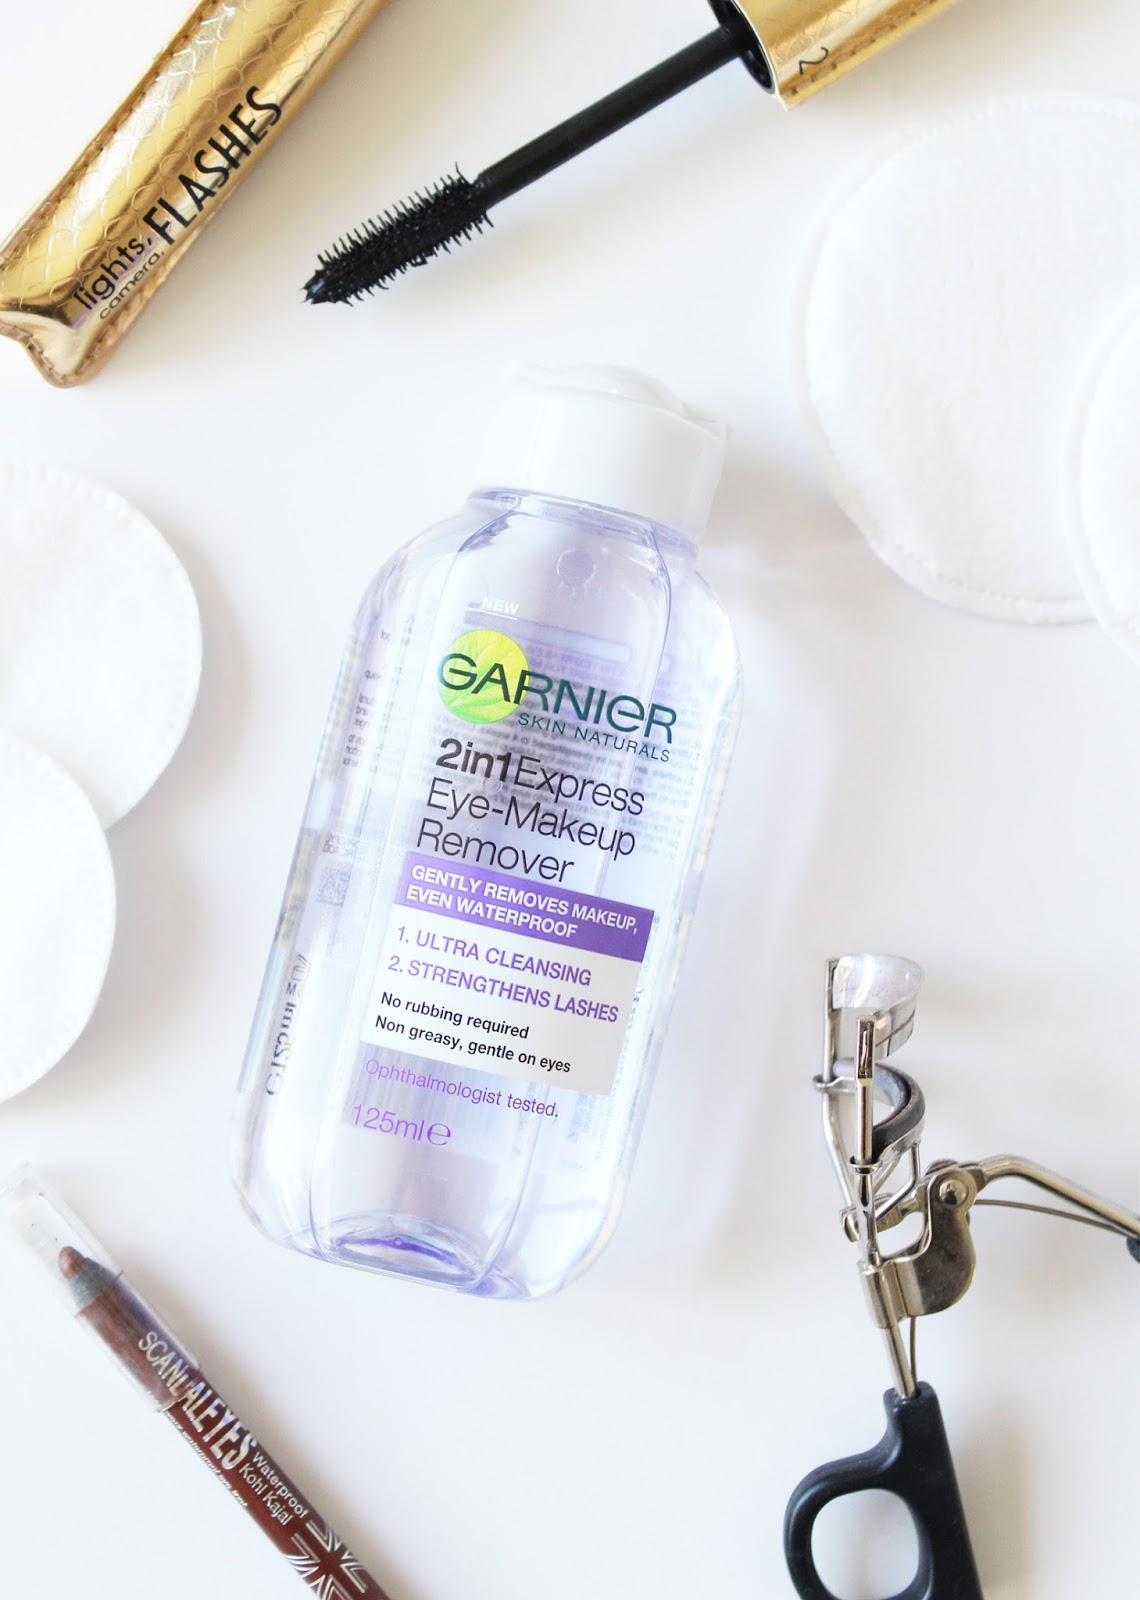 GARNIER | 2-in-1 Express Eye Makeup Remover - Review - CassandraMyee